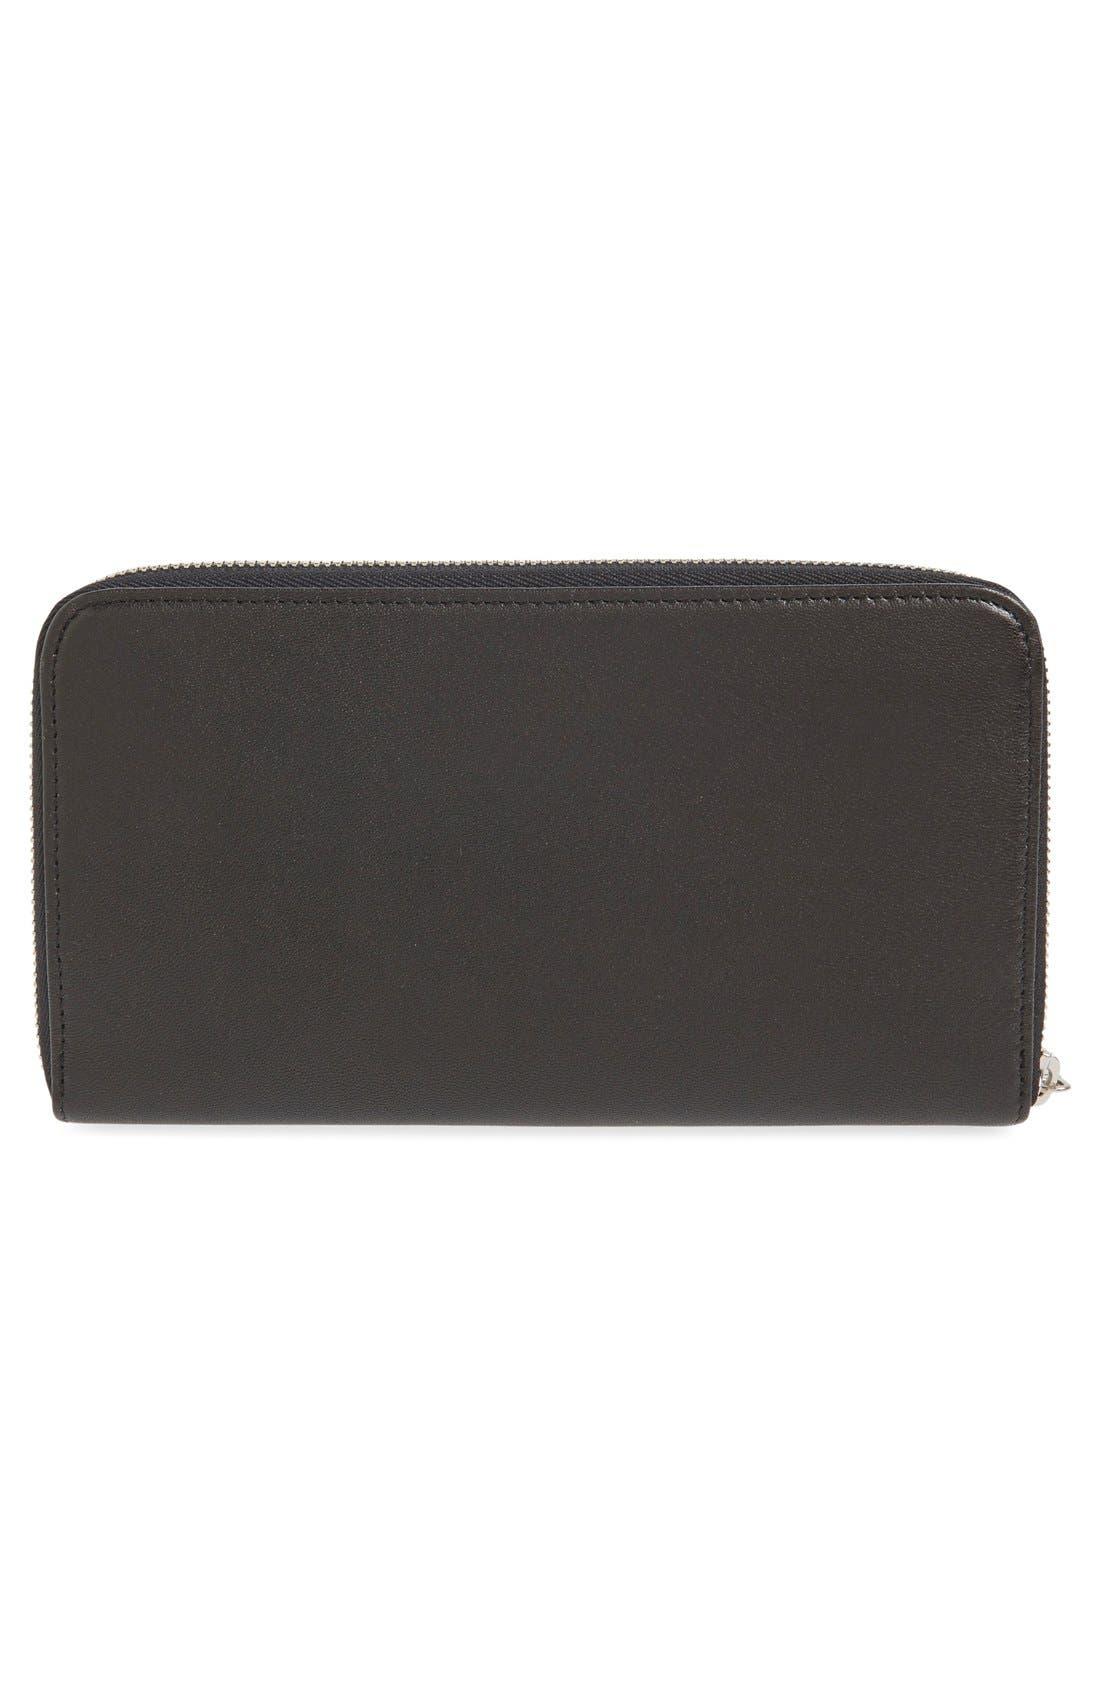 Alternate Image 4  - Longchamp 'Le Pliage' Leather Zip Around Wallet